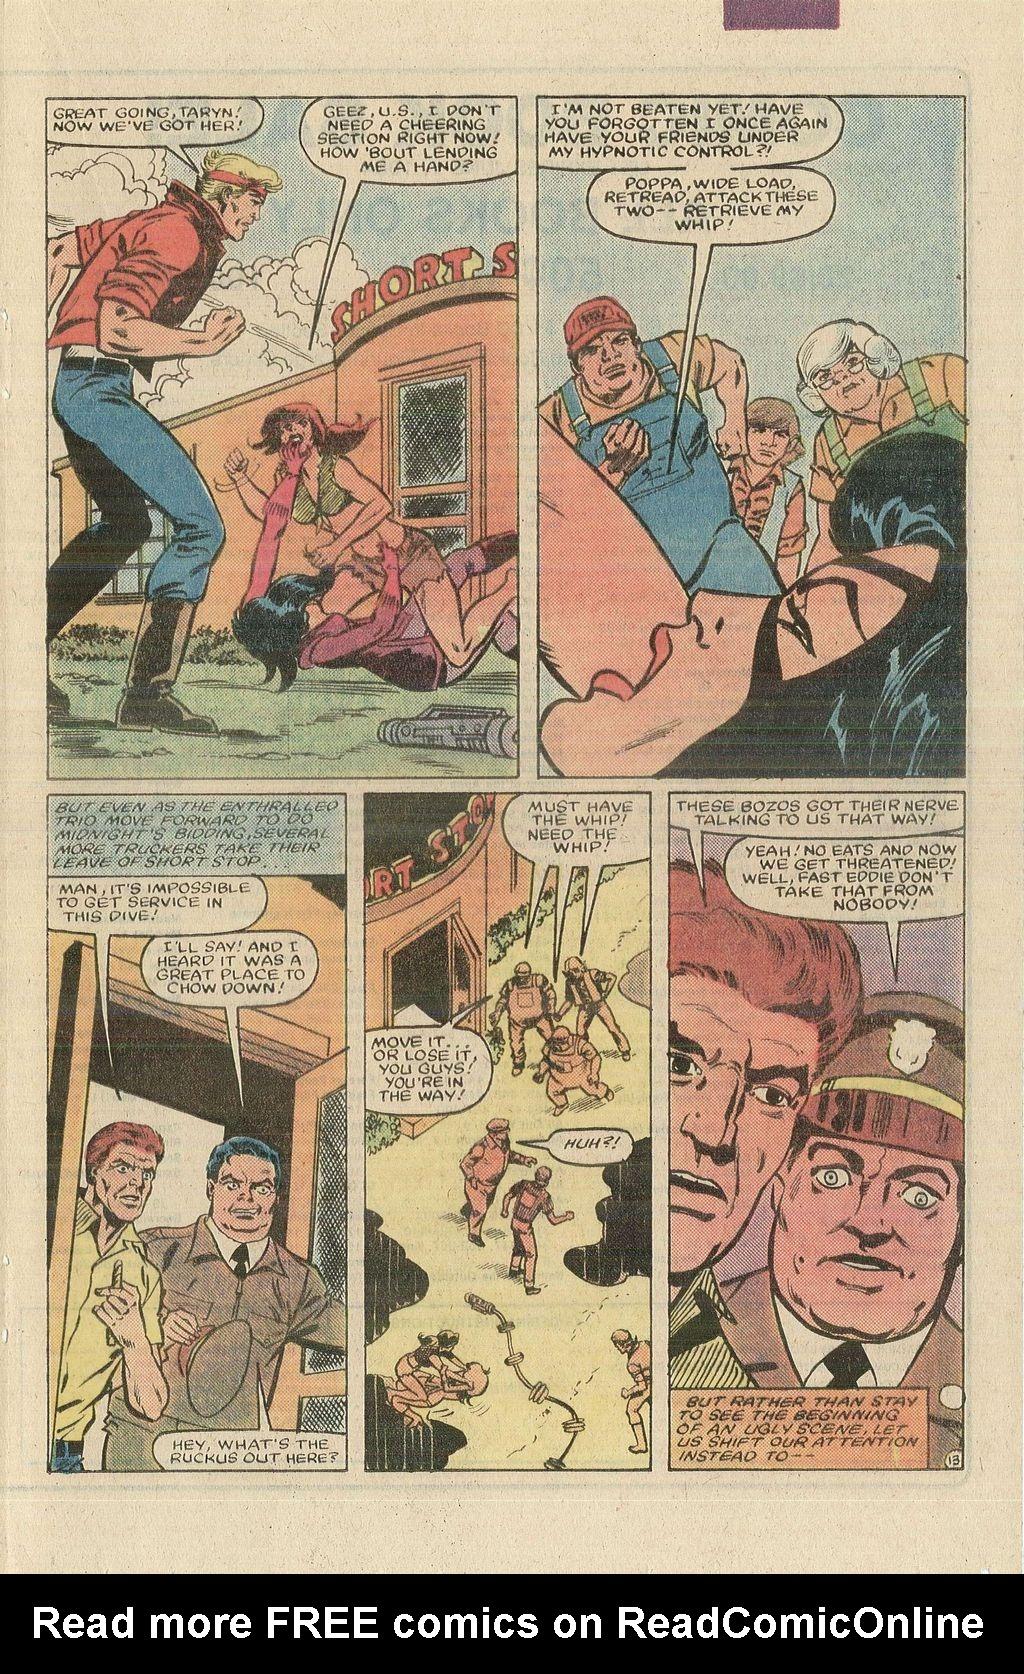 Read online U.S. 1 comic -  Issue #9 - 17